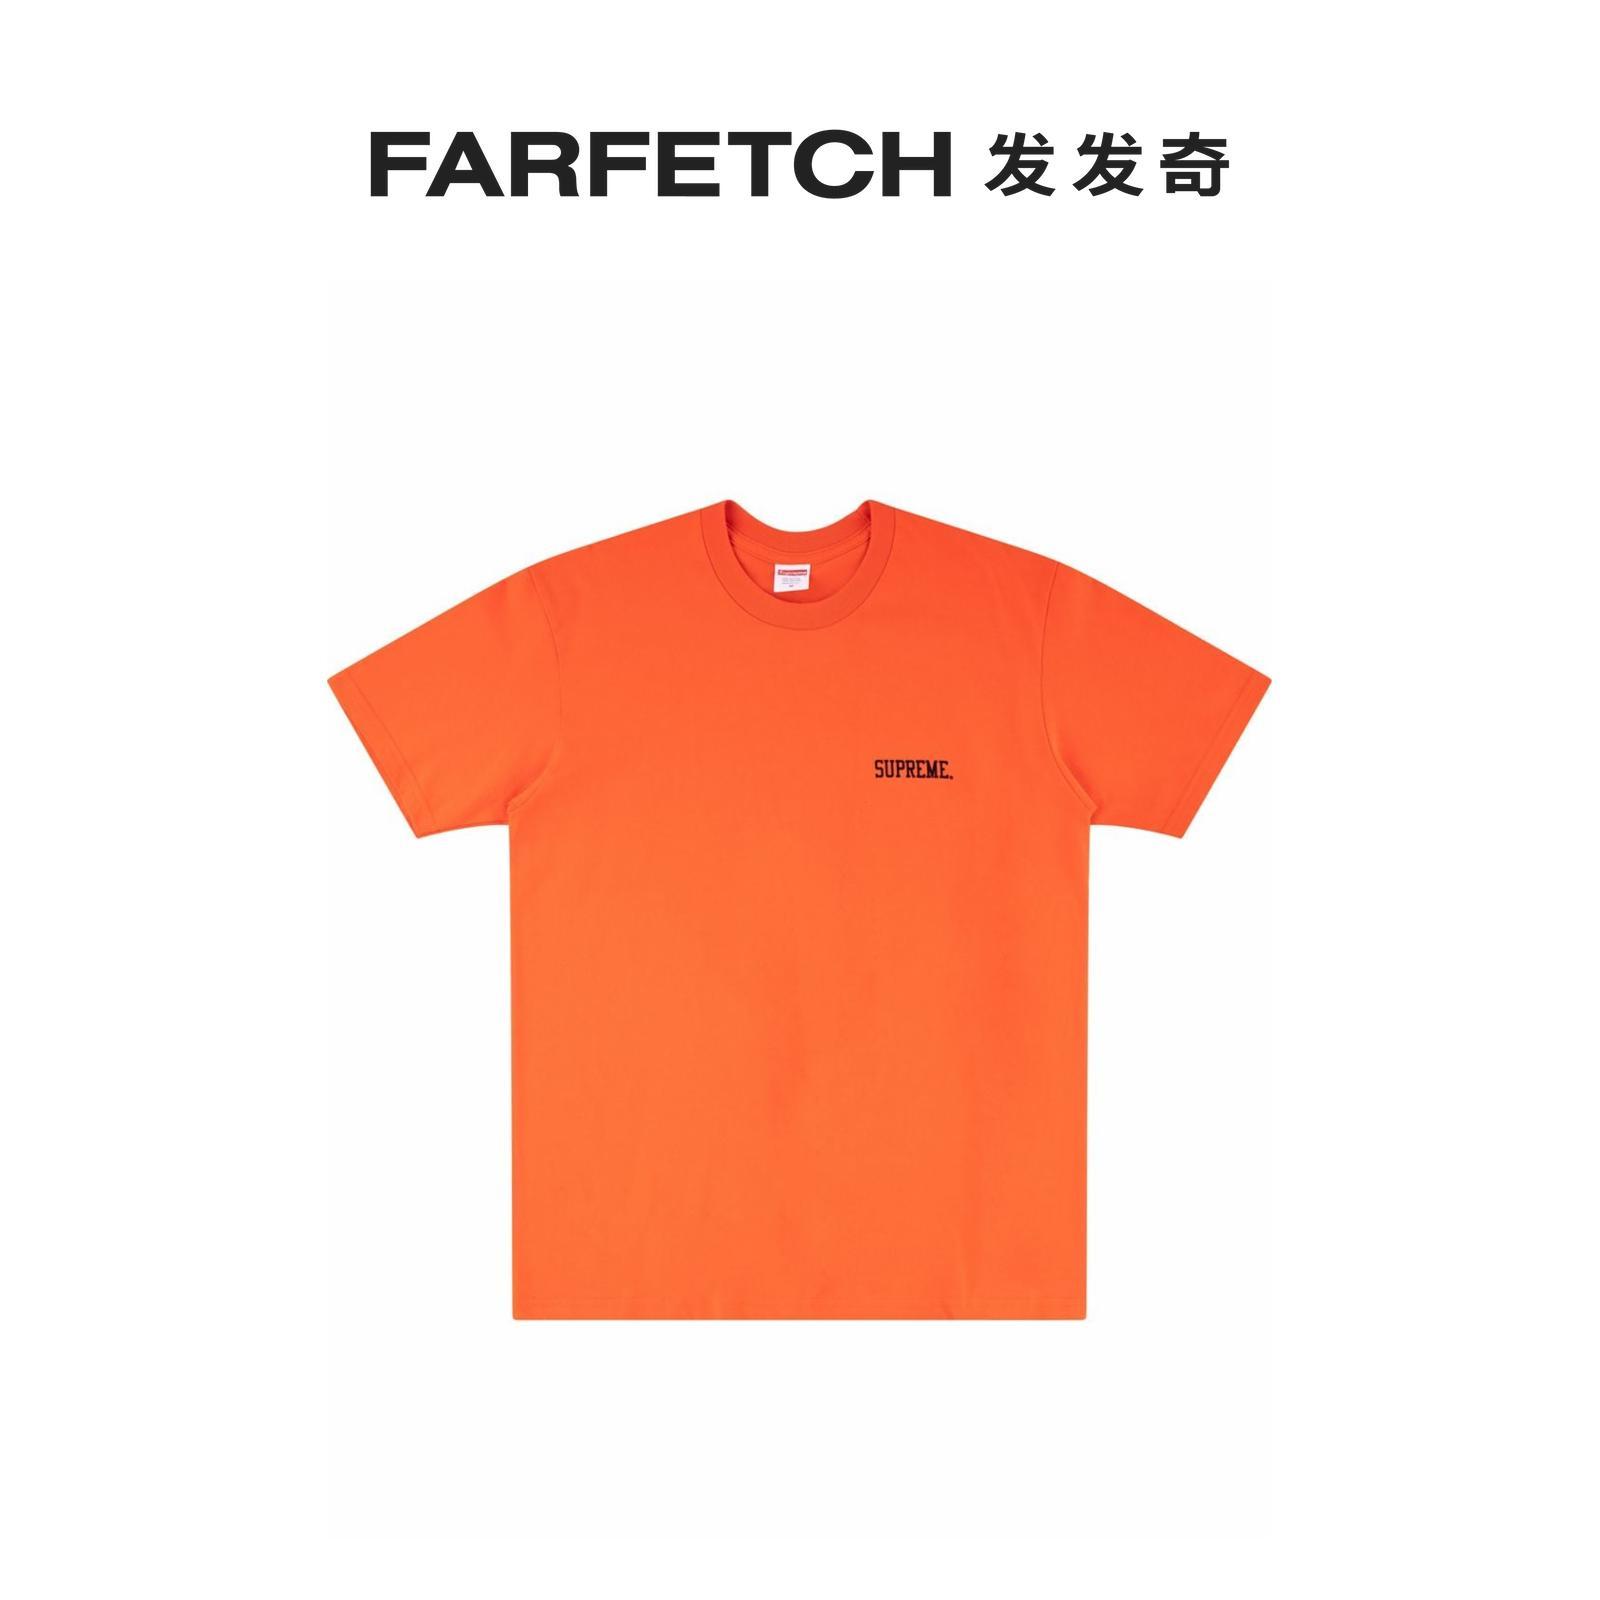 七夕新品Supreme男士Automobili Lamborghini T恤FARFETCH发发奇